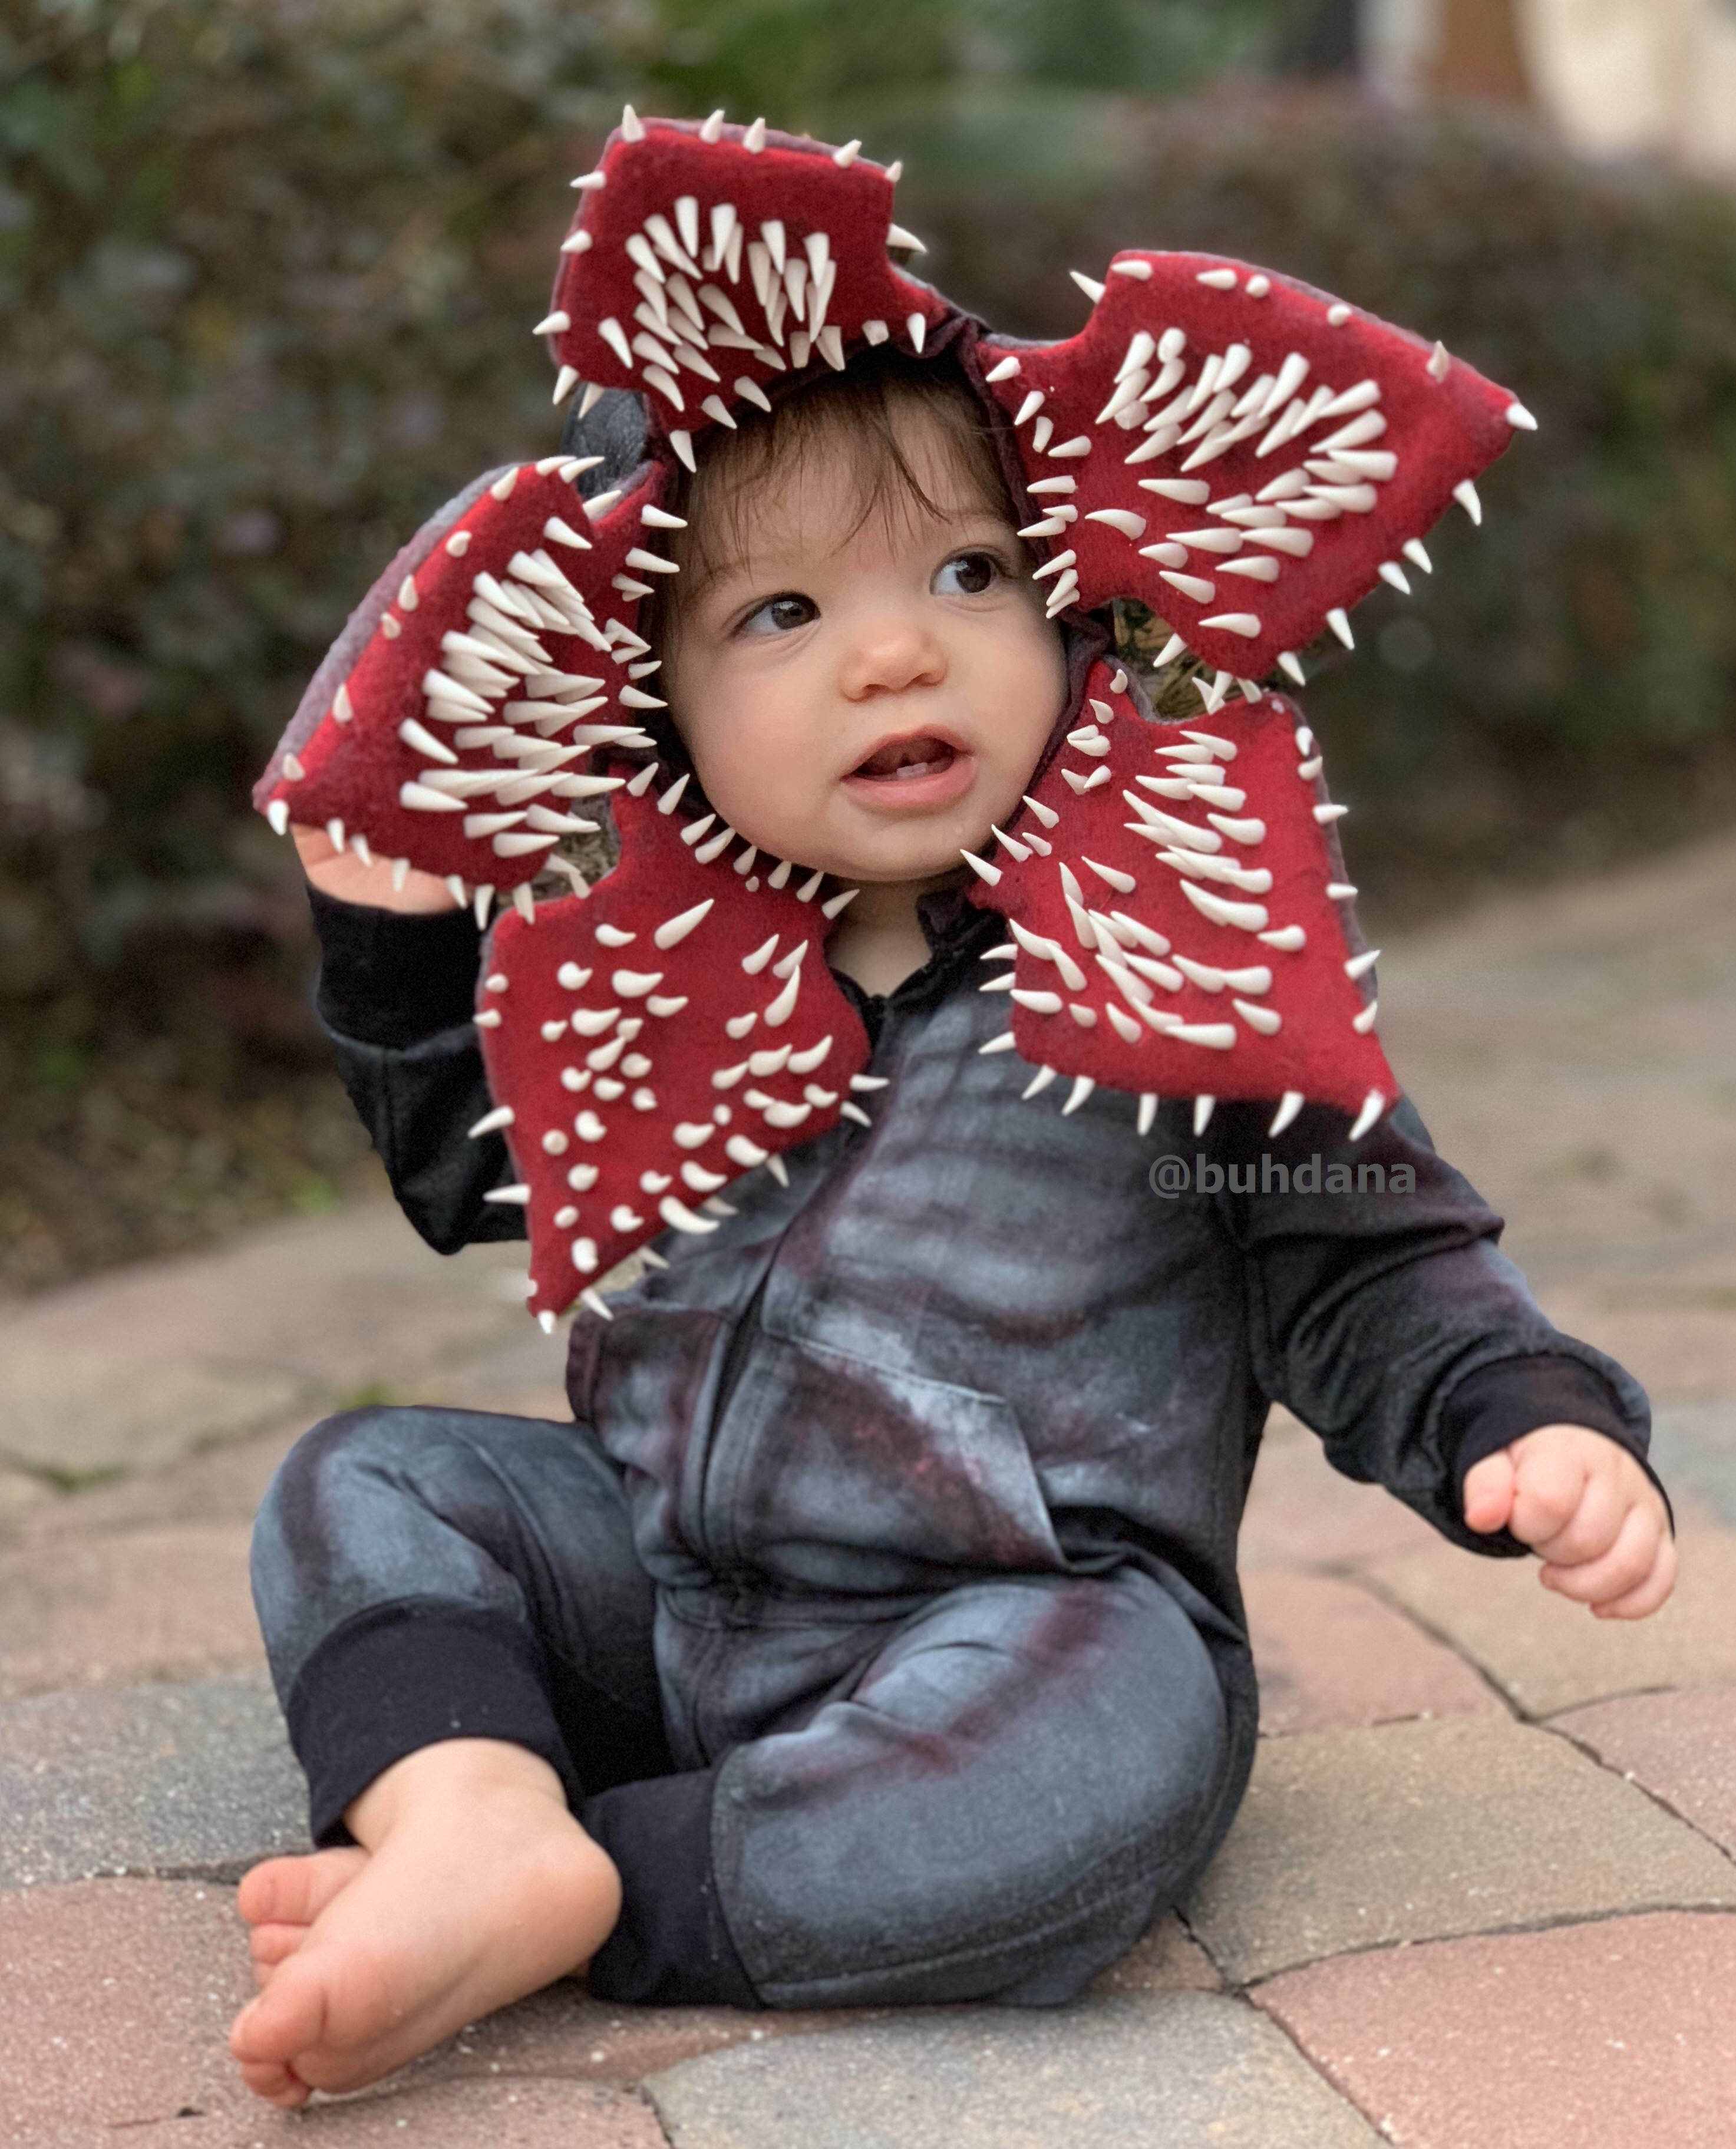 Baby Demogorgon costume buhdana